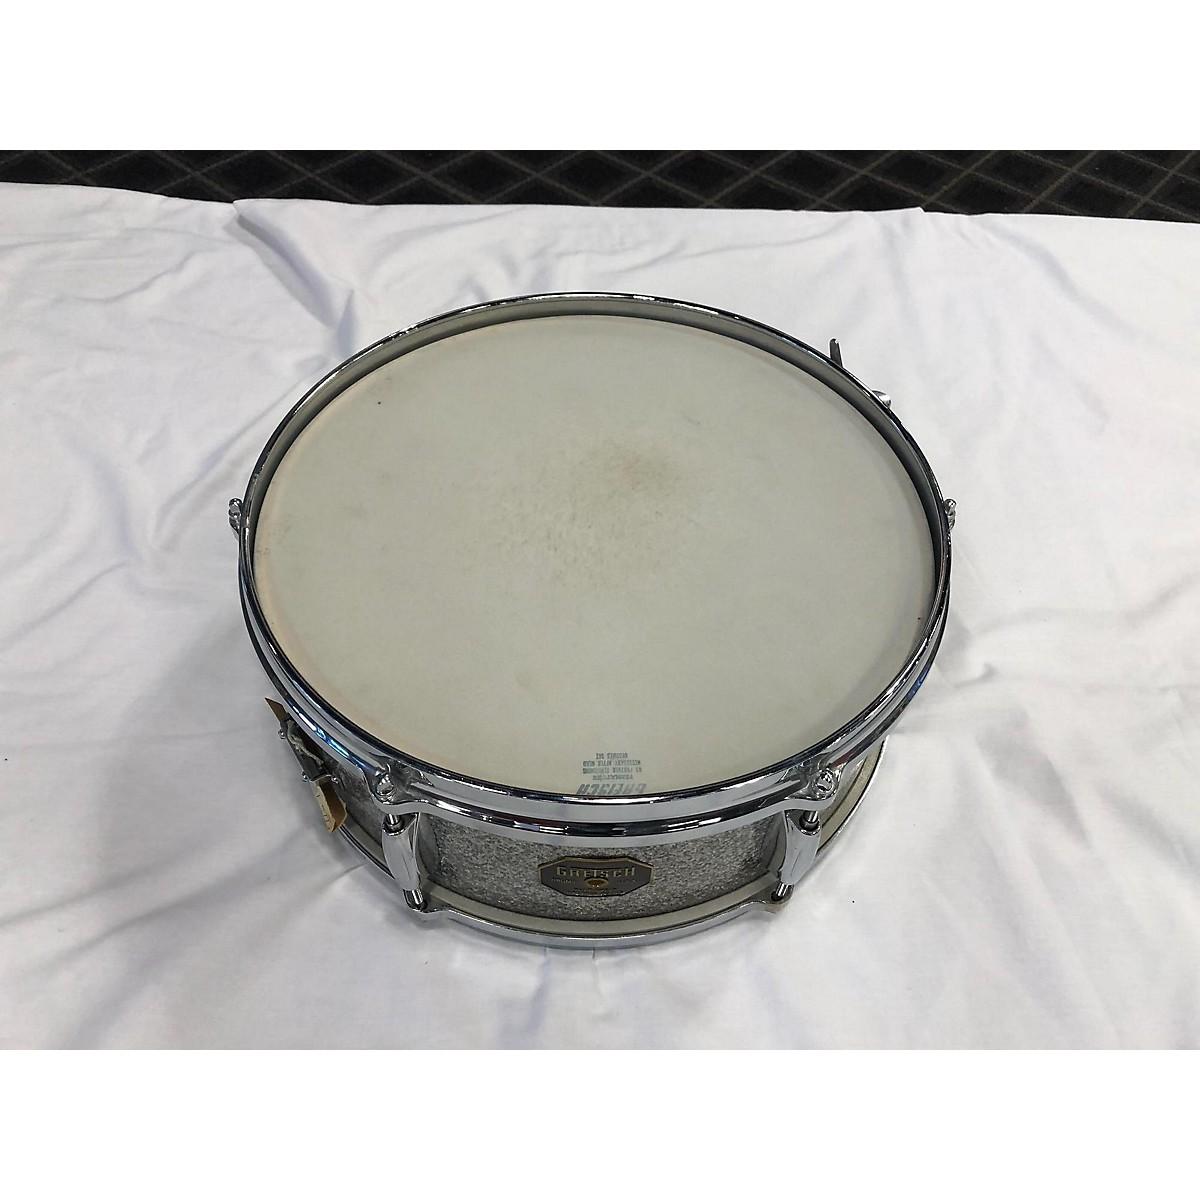 In Store Vintage Vintage 1971 Gretsch 5.5X14 415-7 Sparkling Silver Snare Drum Sparkling Silver